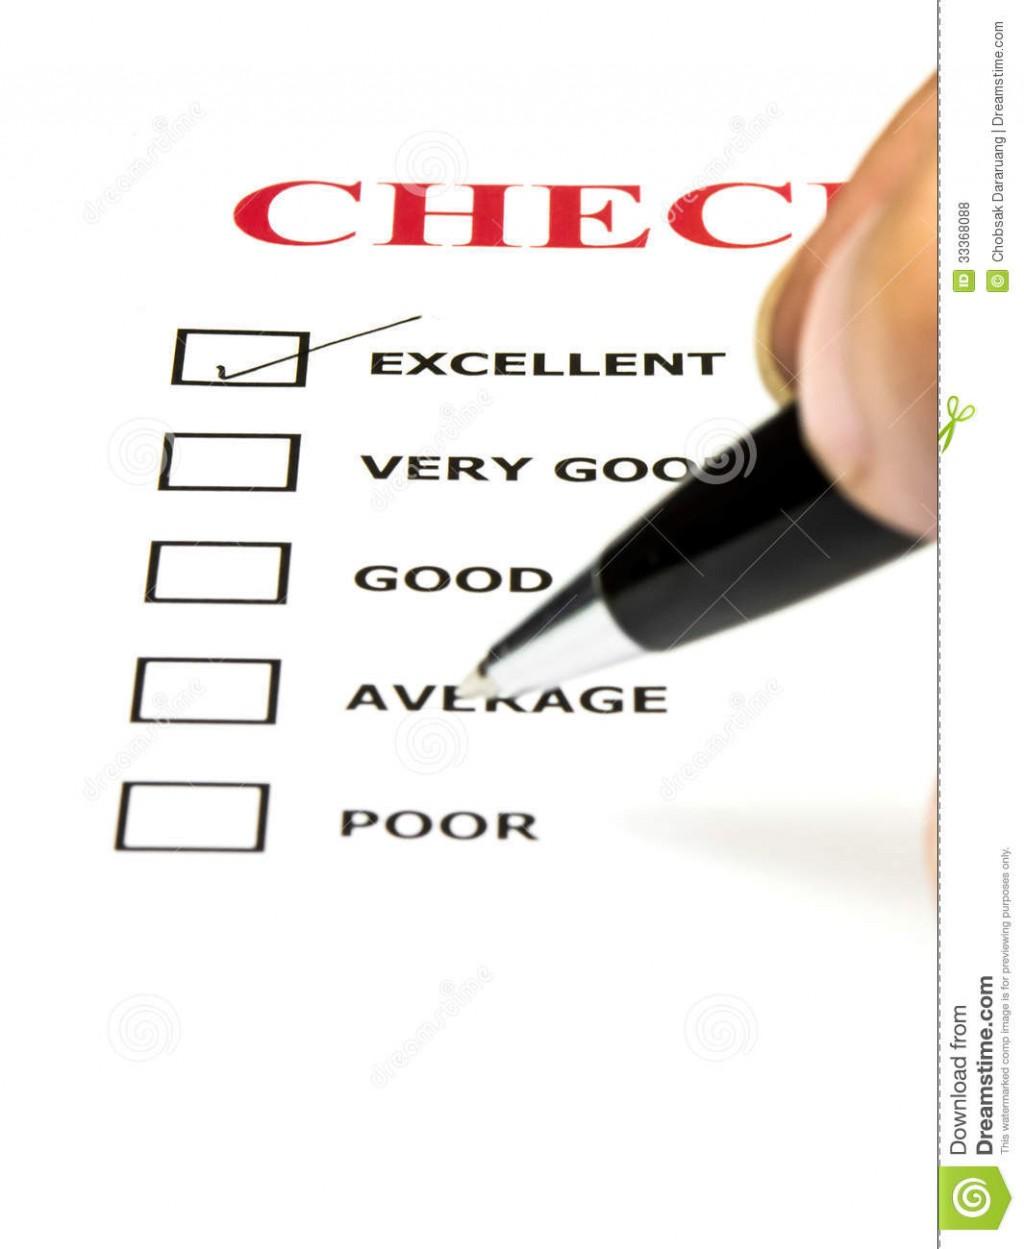 002 Essay Example Check List Survay Paper Close Up Angled Shot Survey Form Tick Excellent Box Customer Service Unique Checking Services Persuasive Checklist Pdf Checker Grammar Punctuation Free Large